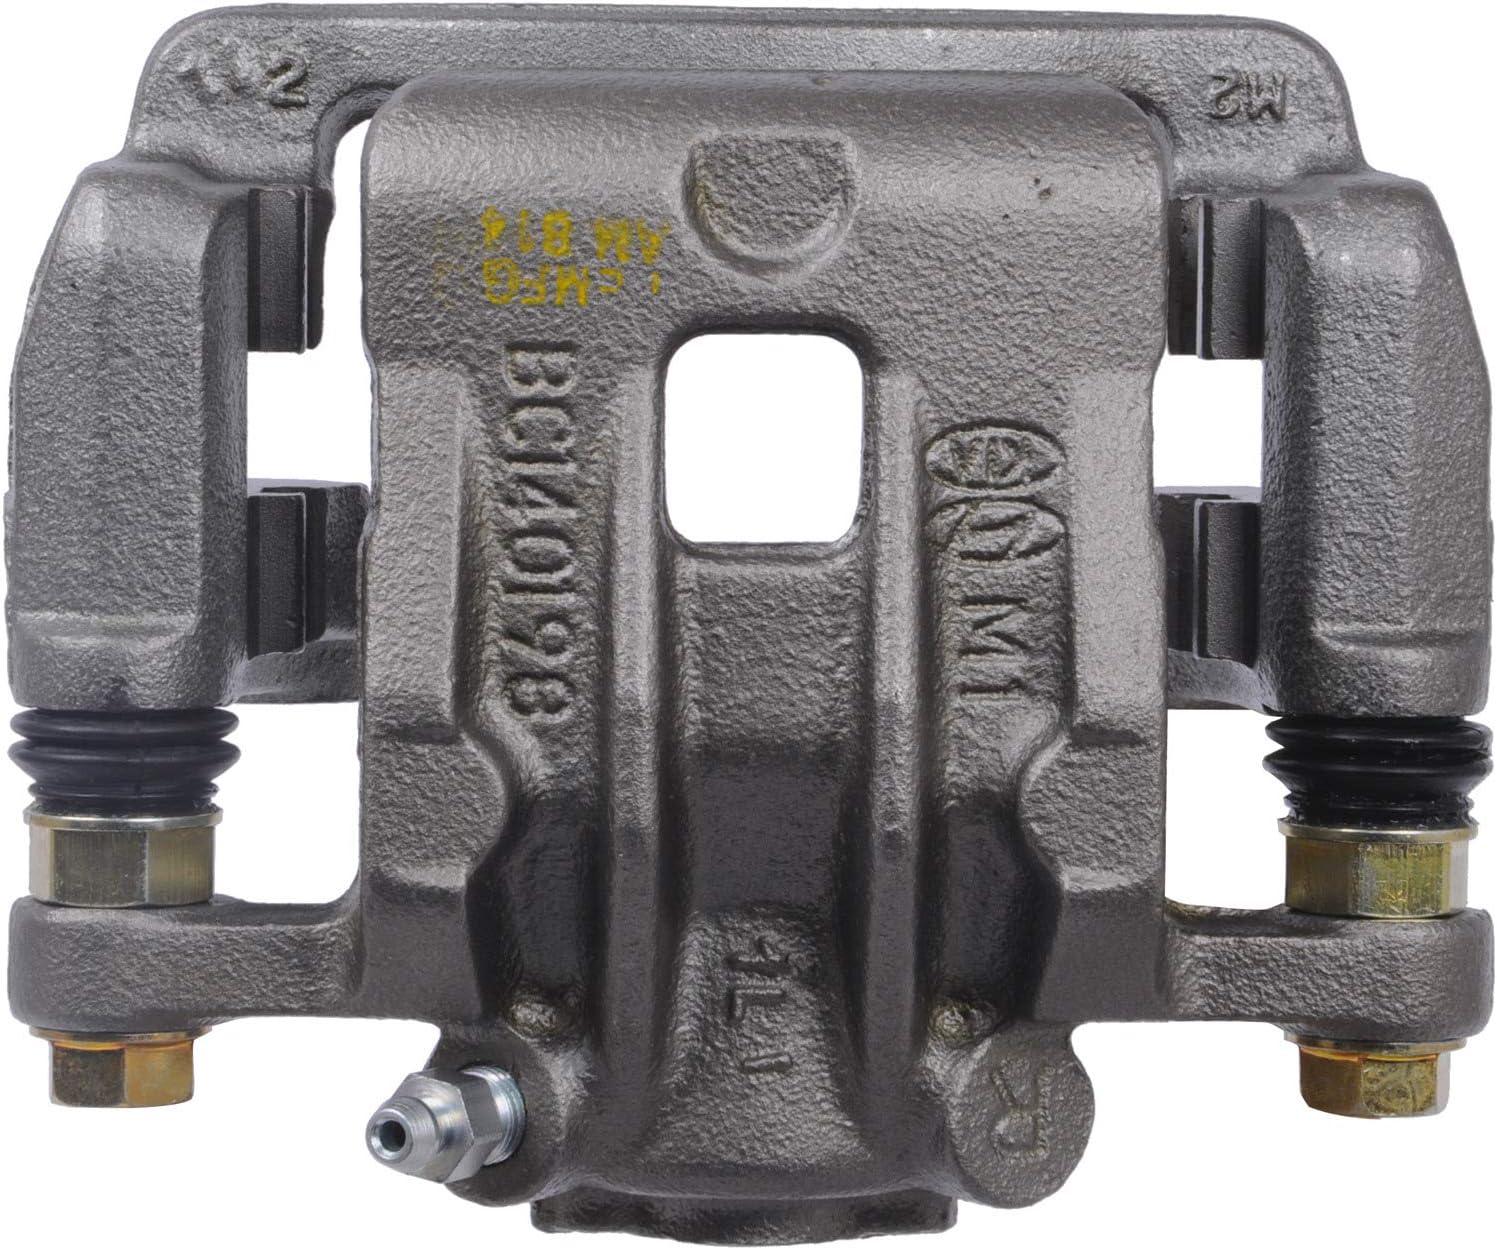 Cardone 19-B6466 Remanufactured Unloaded Disc Brake Caliper with Bracket